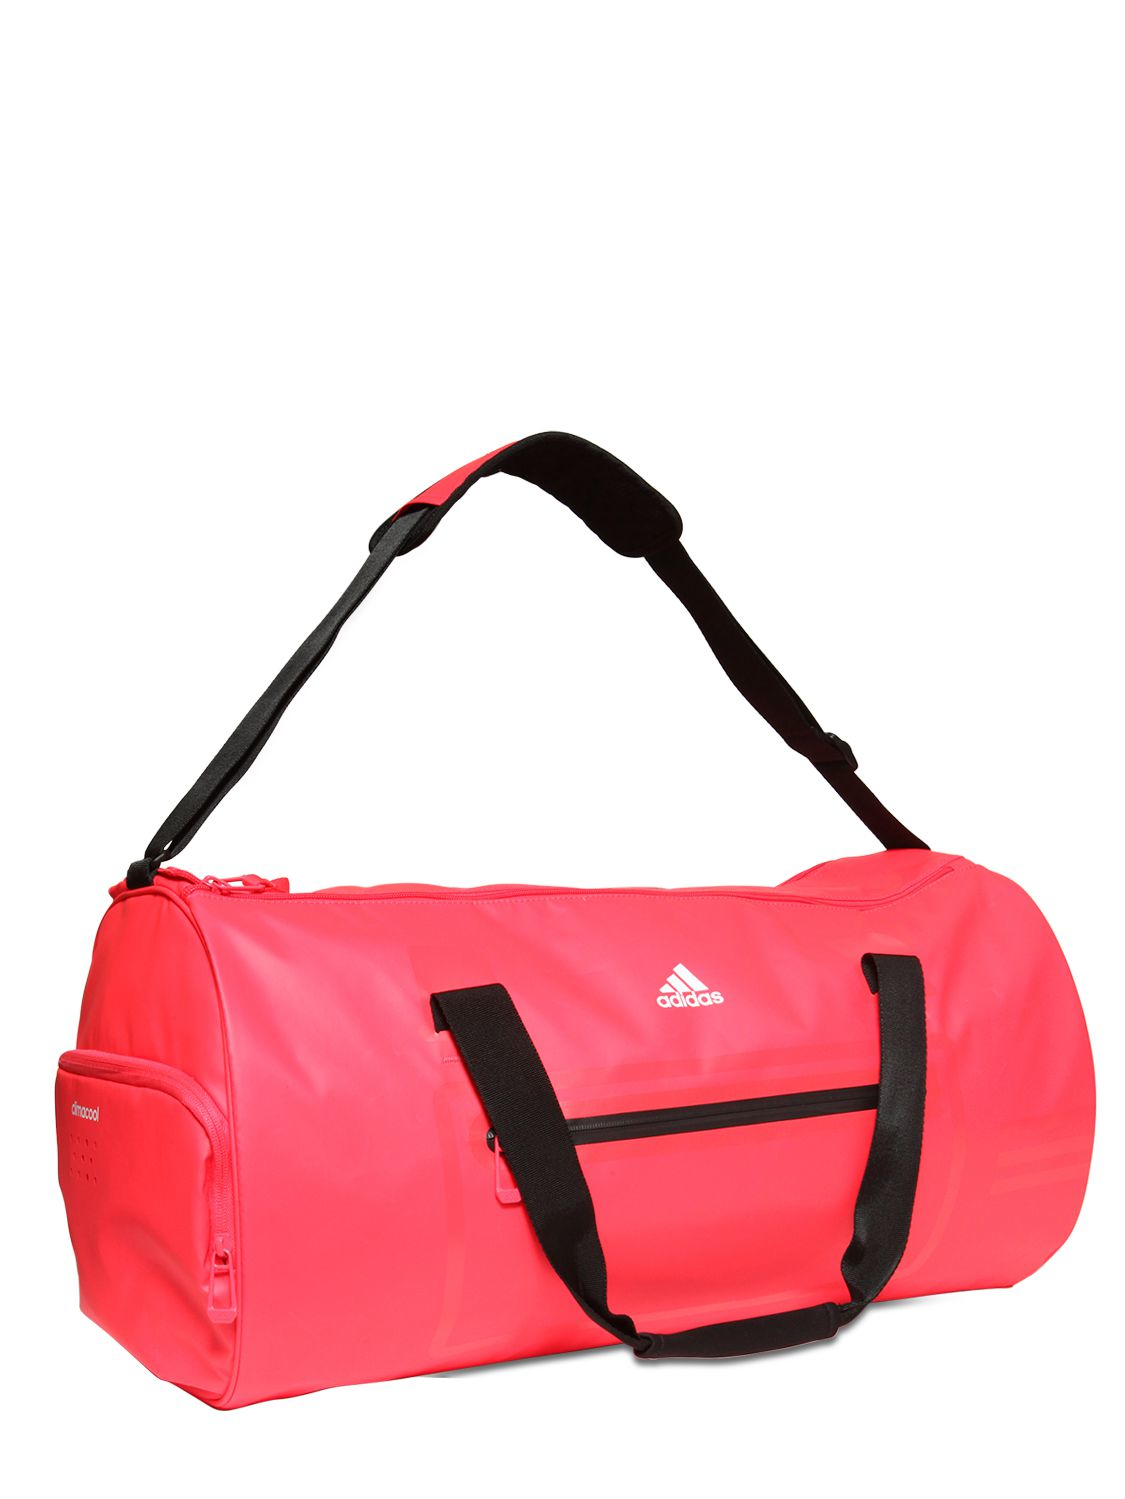 Adidas Originals Water Repellent Coated Nylon Duffle Bag In Red